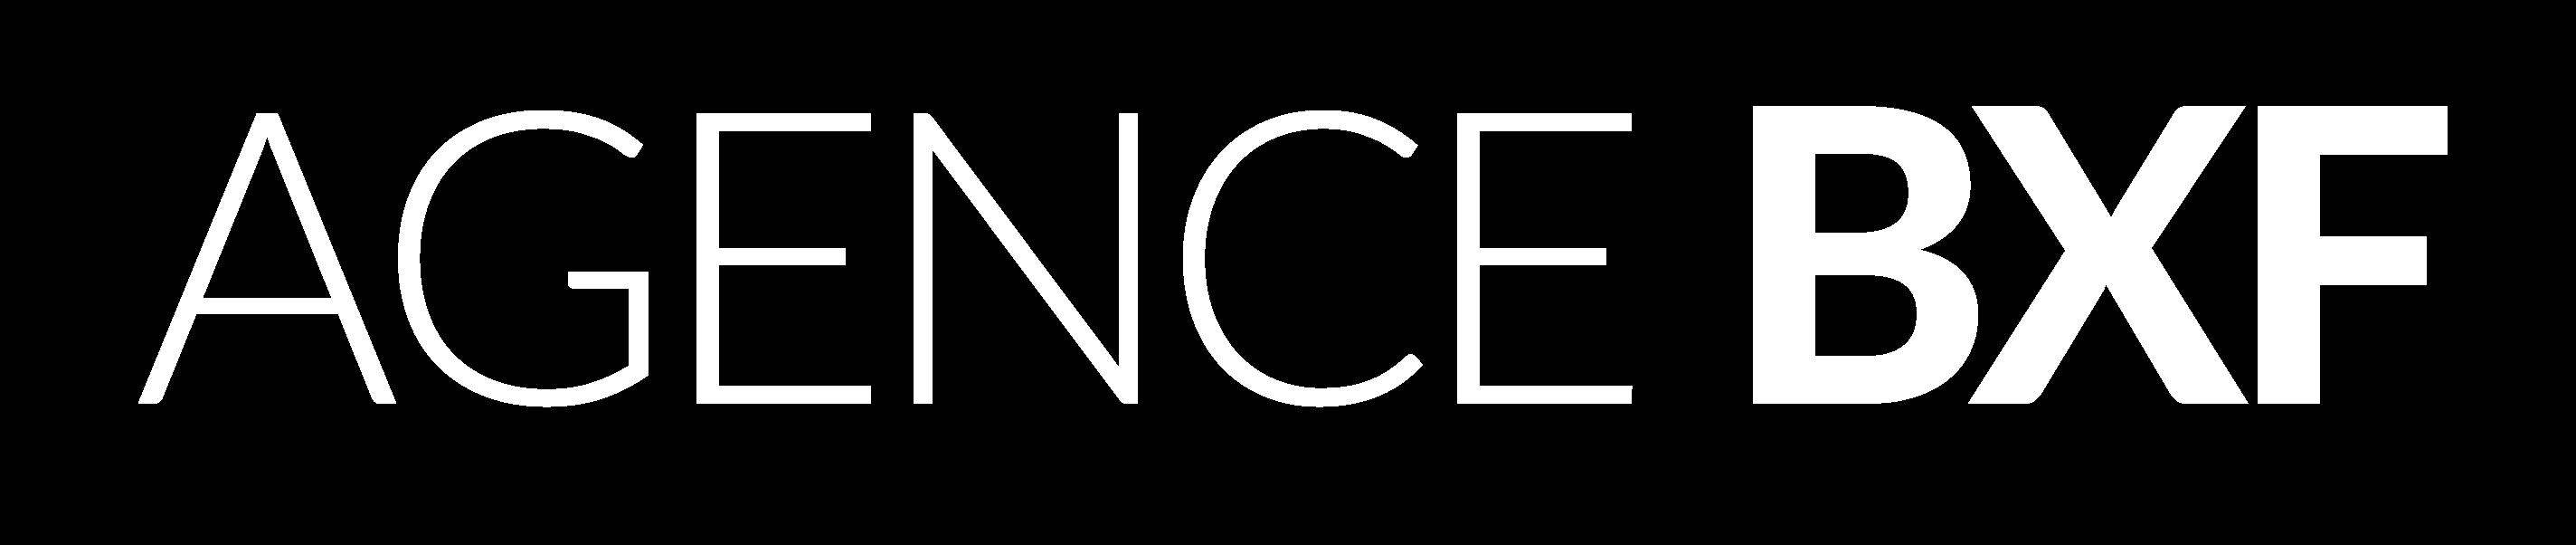 logo_blanc_lato